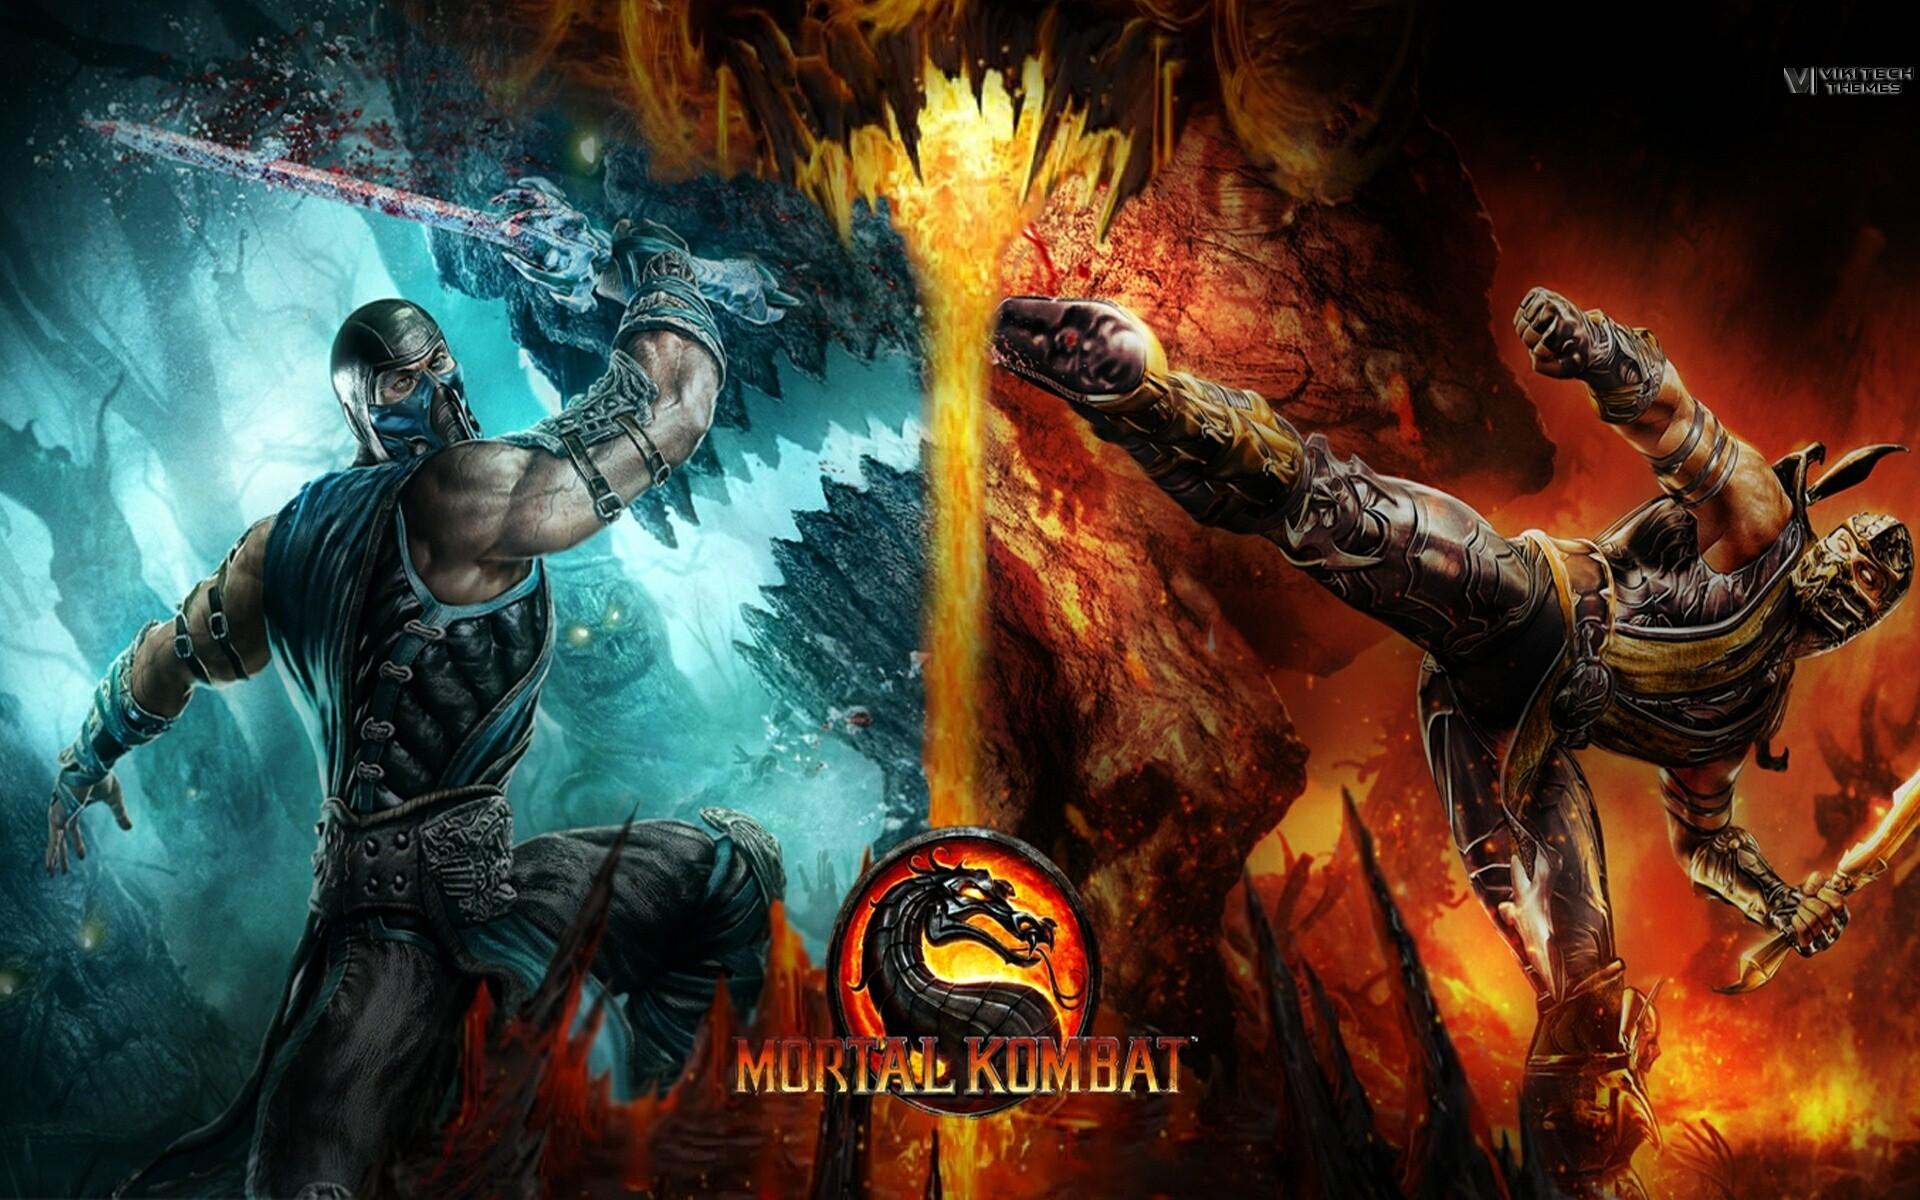 Mortal Kombat Scorpion Vs Sub Zero Wallpaper Wallpapertag